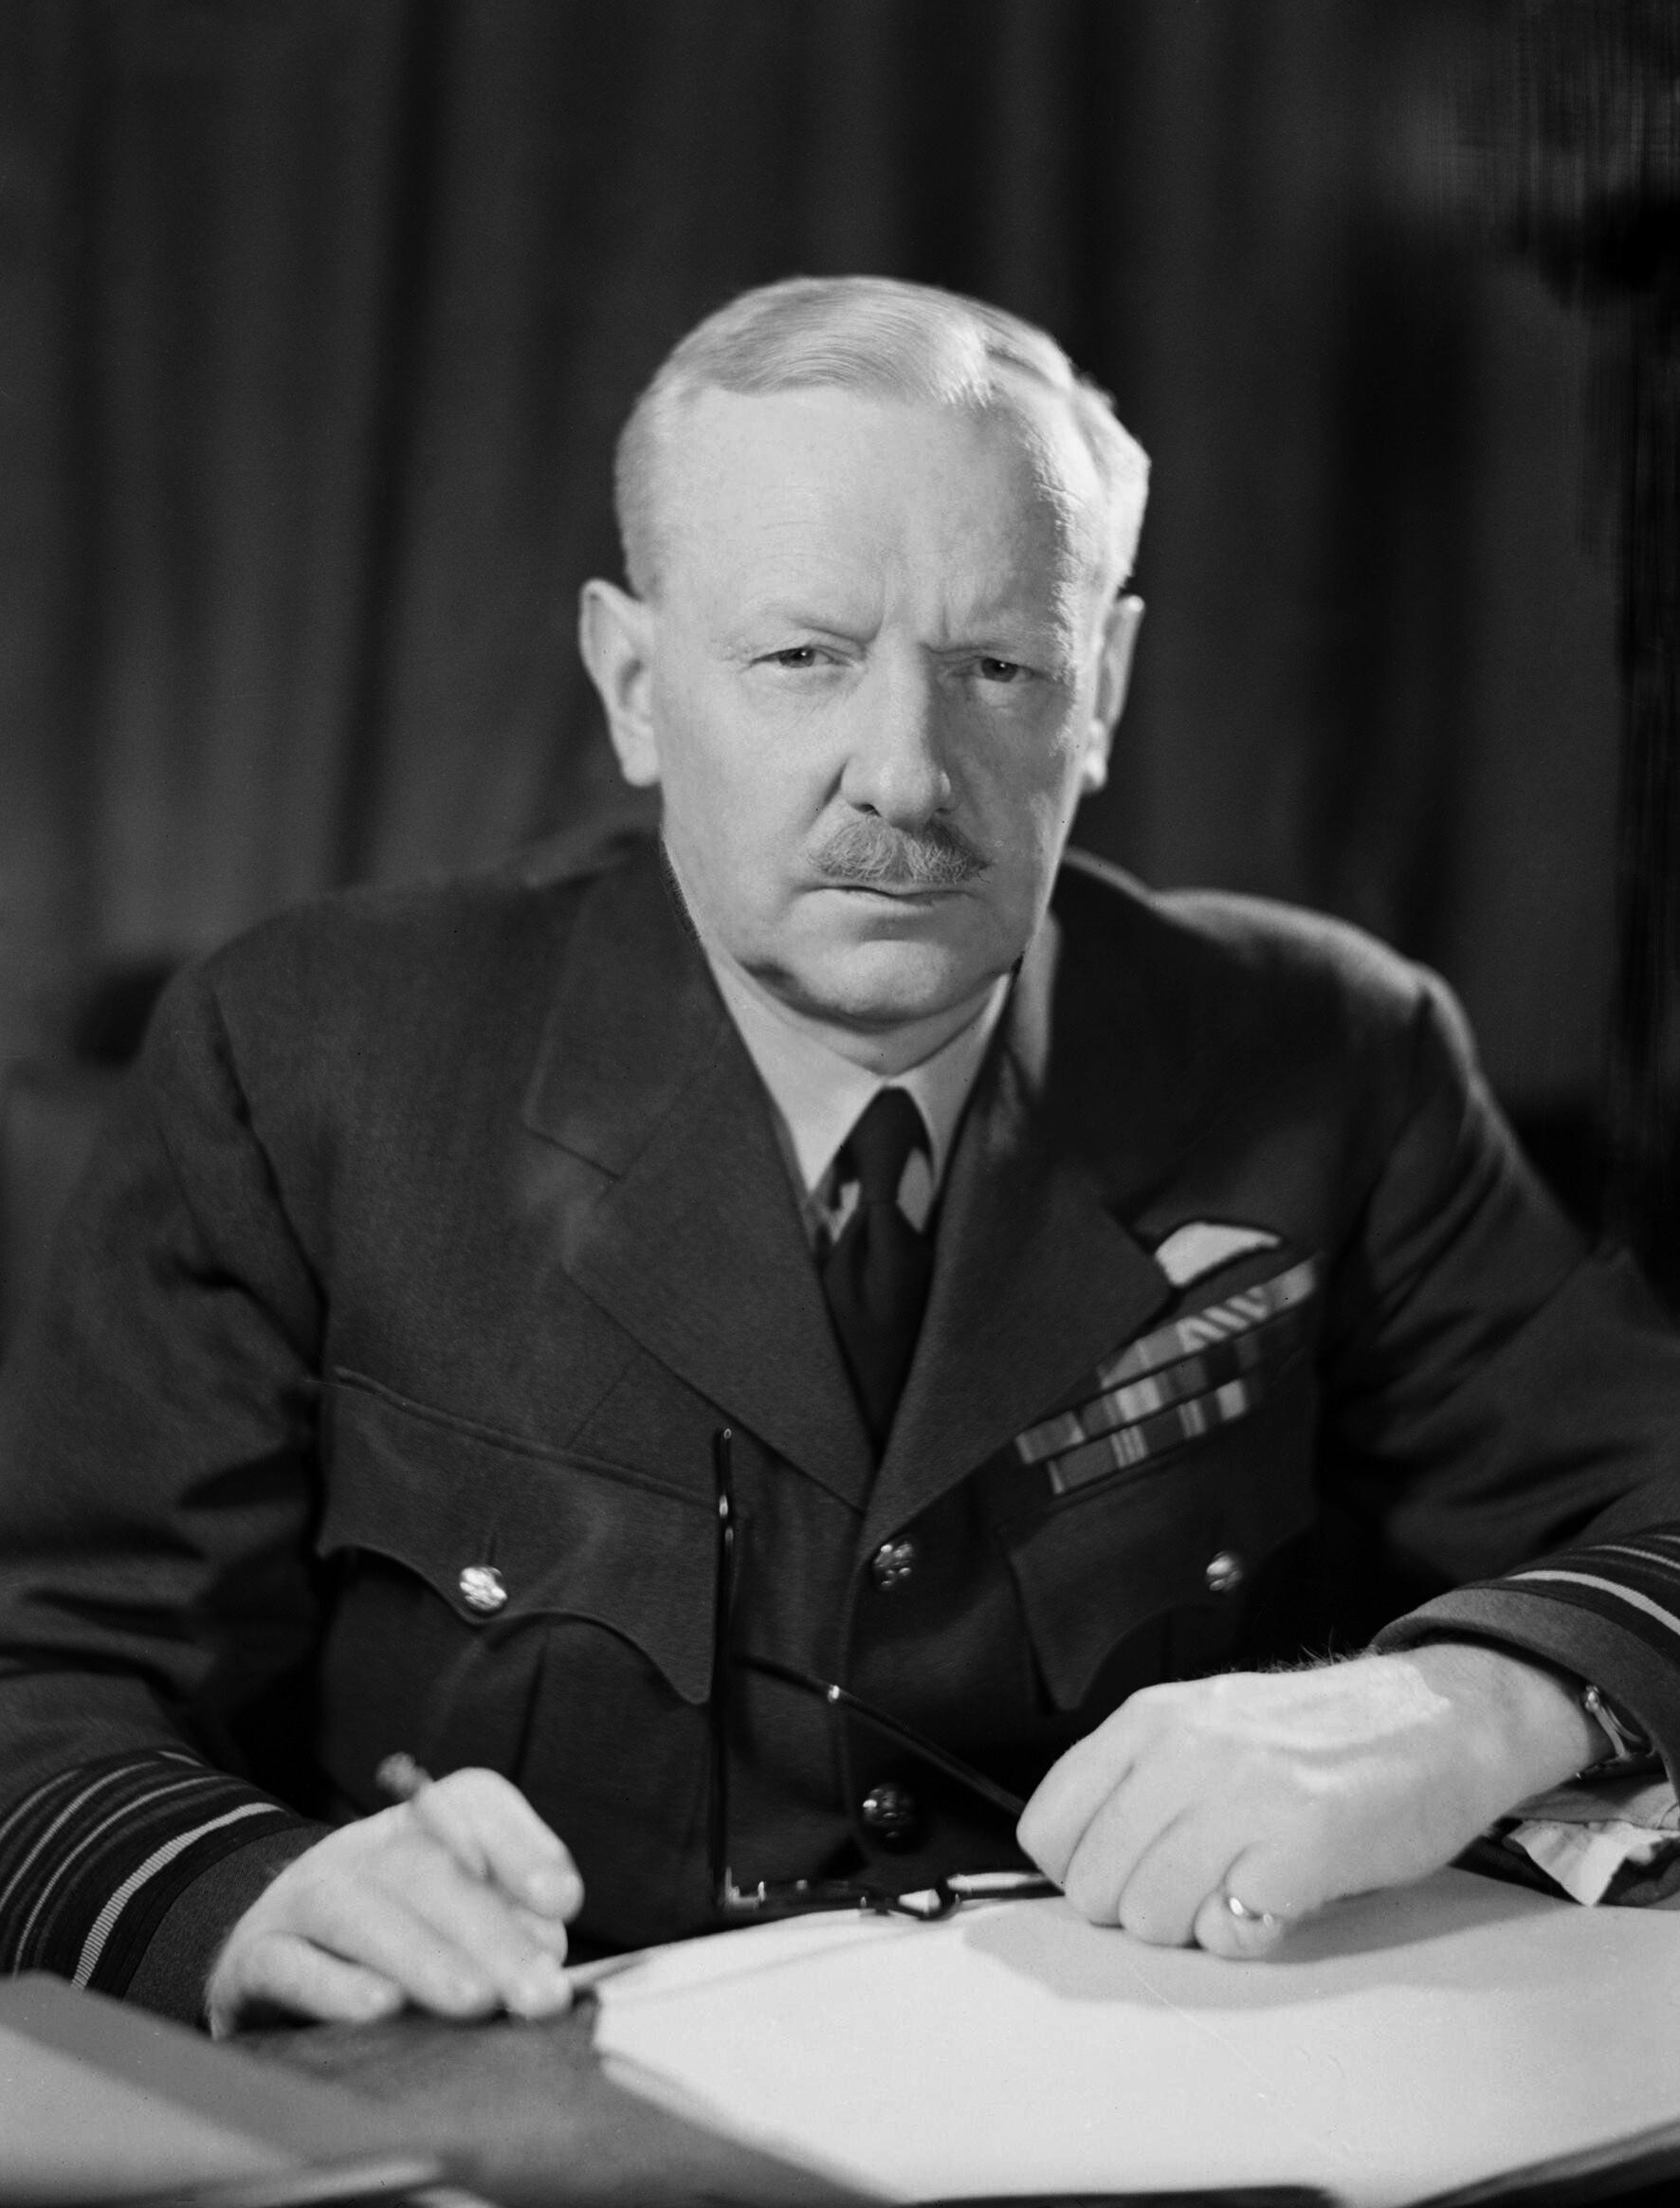 [Bild: Air_Chief_Marshal_Sir_Arthur_Harris.jpg]